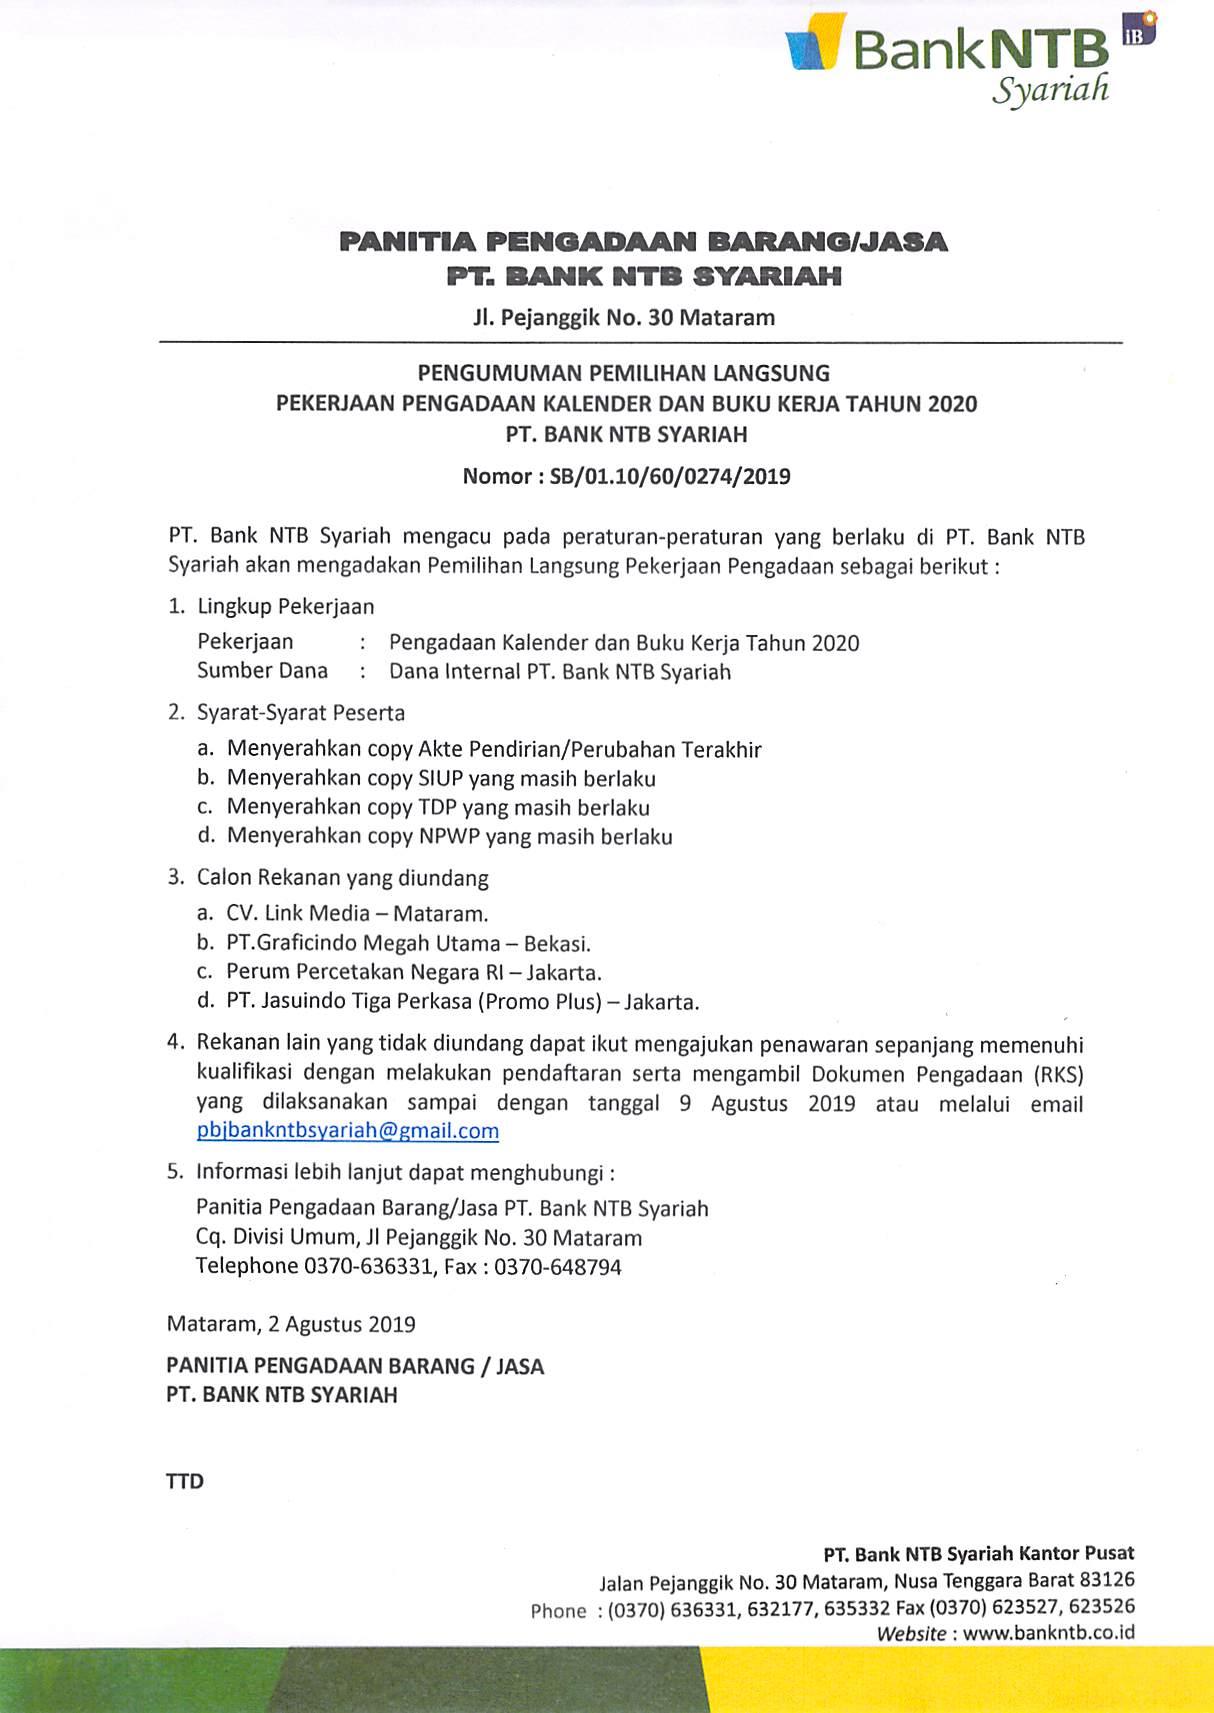 Pengadaan-Kalender-dan-Buku-Kerja-PT-Bank-NTB-Syariah-tahun-2020